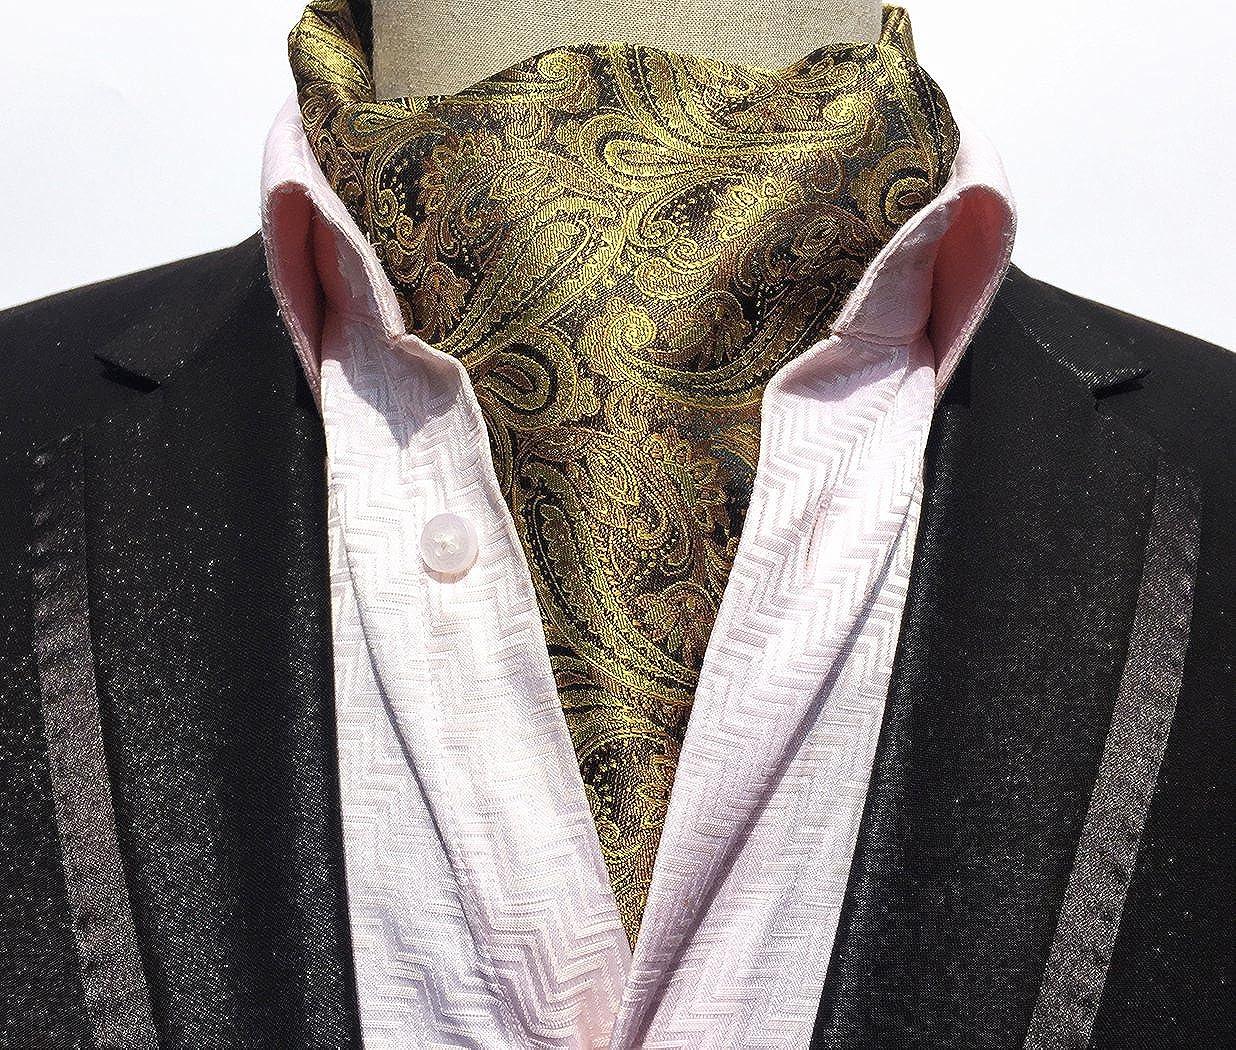 Color : D YLQC Mens Fashion 100/% Silk Classic Cravat Paisley Floral Jacquard Woven Self Tie Luxury Double-Sided Ascot